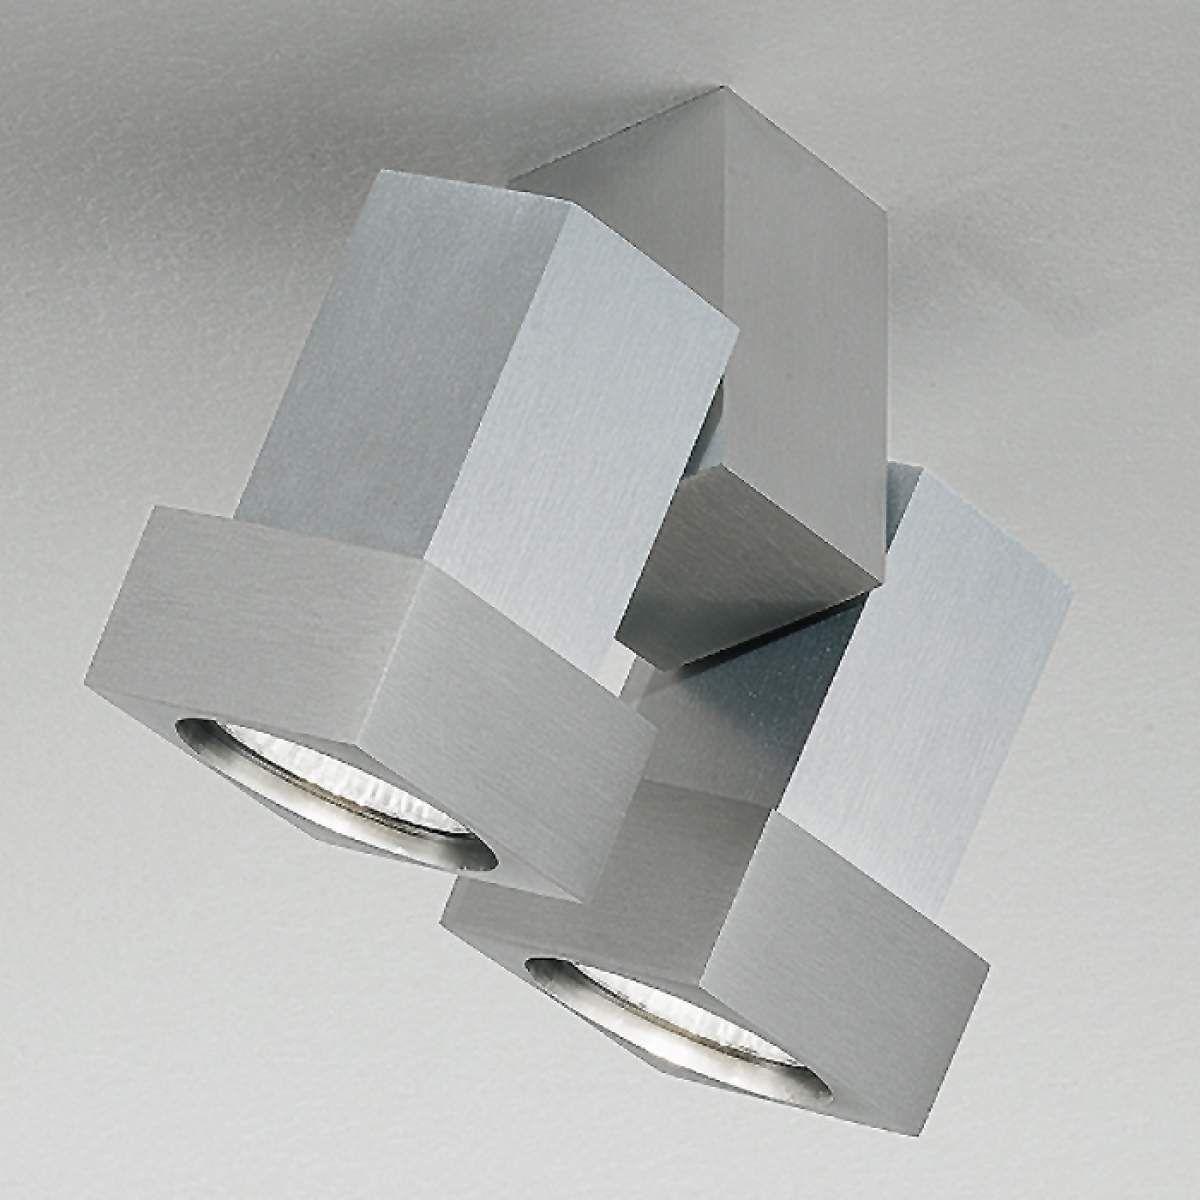 Spot Lampe Led 12v Weisse Led Spots 3 Fach Strahler Aufputz Spots Led Wandleuchte Strahler Wandstrahler Strahler Strahler Mit Bewegungsmelder